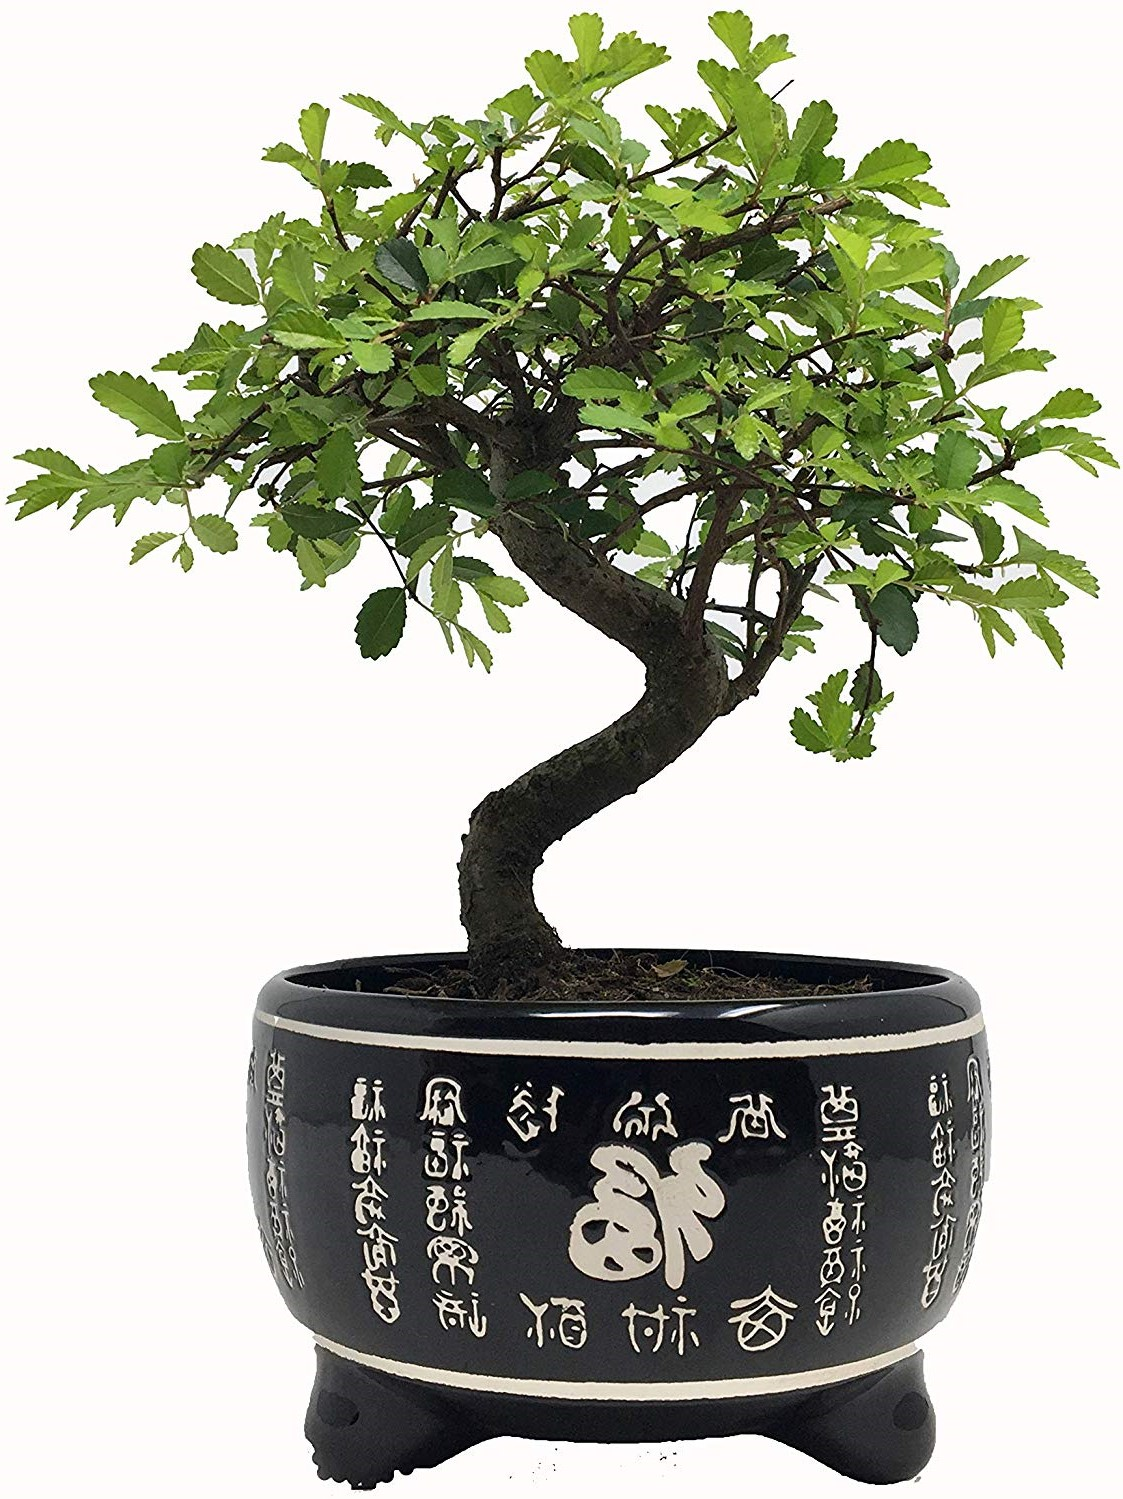 Jeune bonsaï.